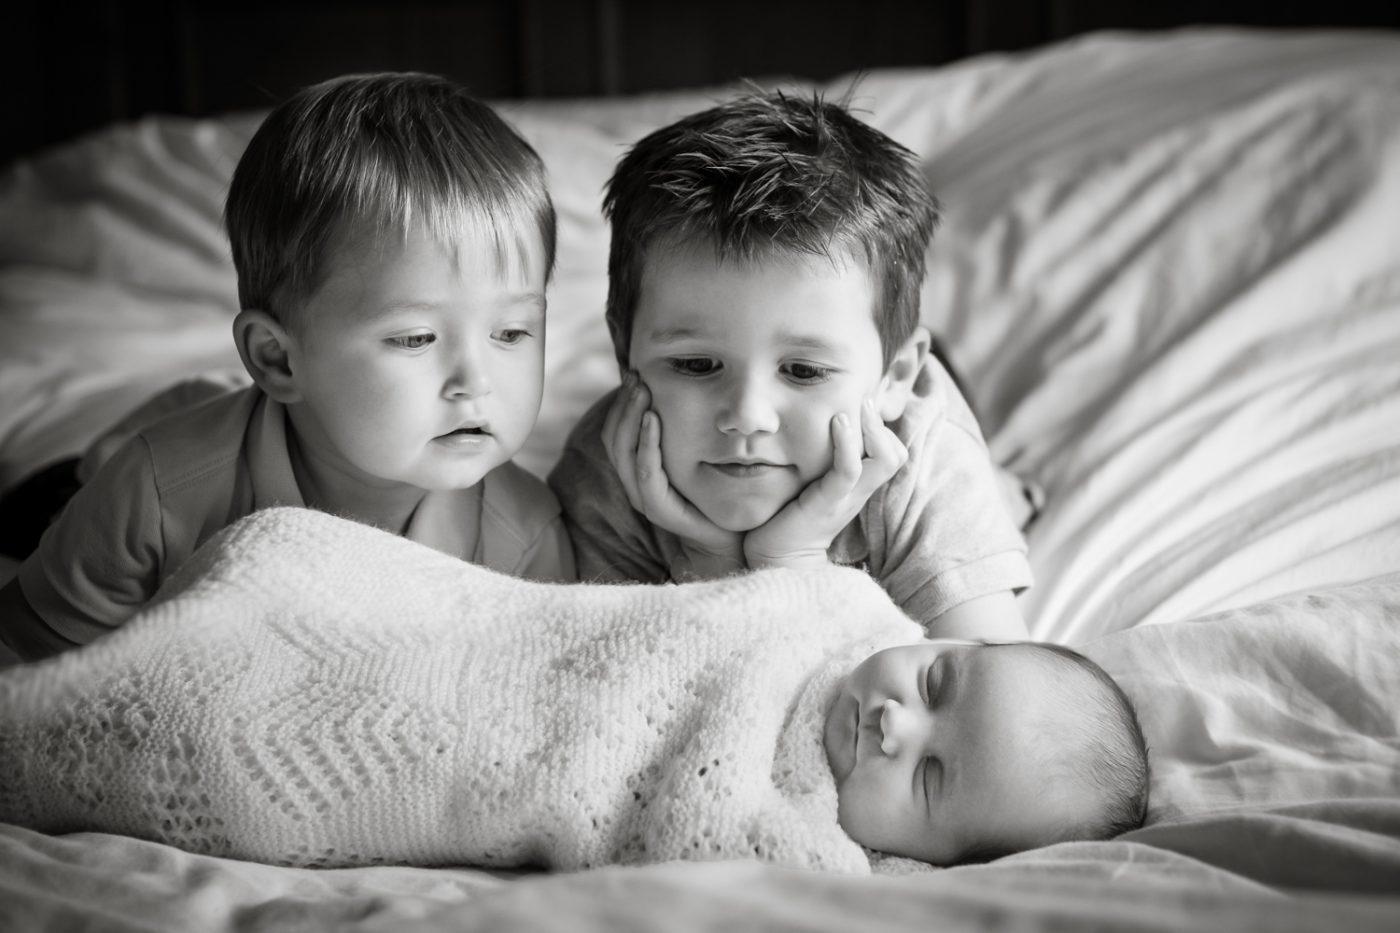 photographer fleet, family photographer fleet, baby photographer fleet, childrens photographer fleet